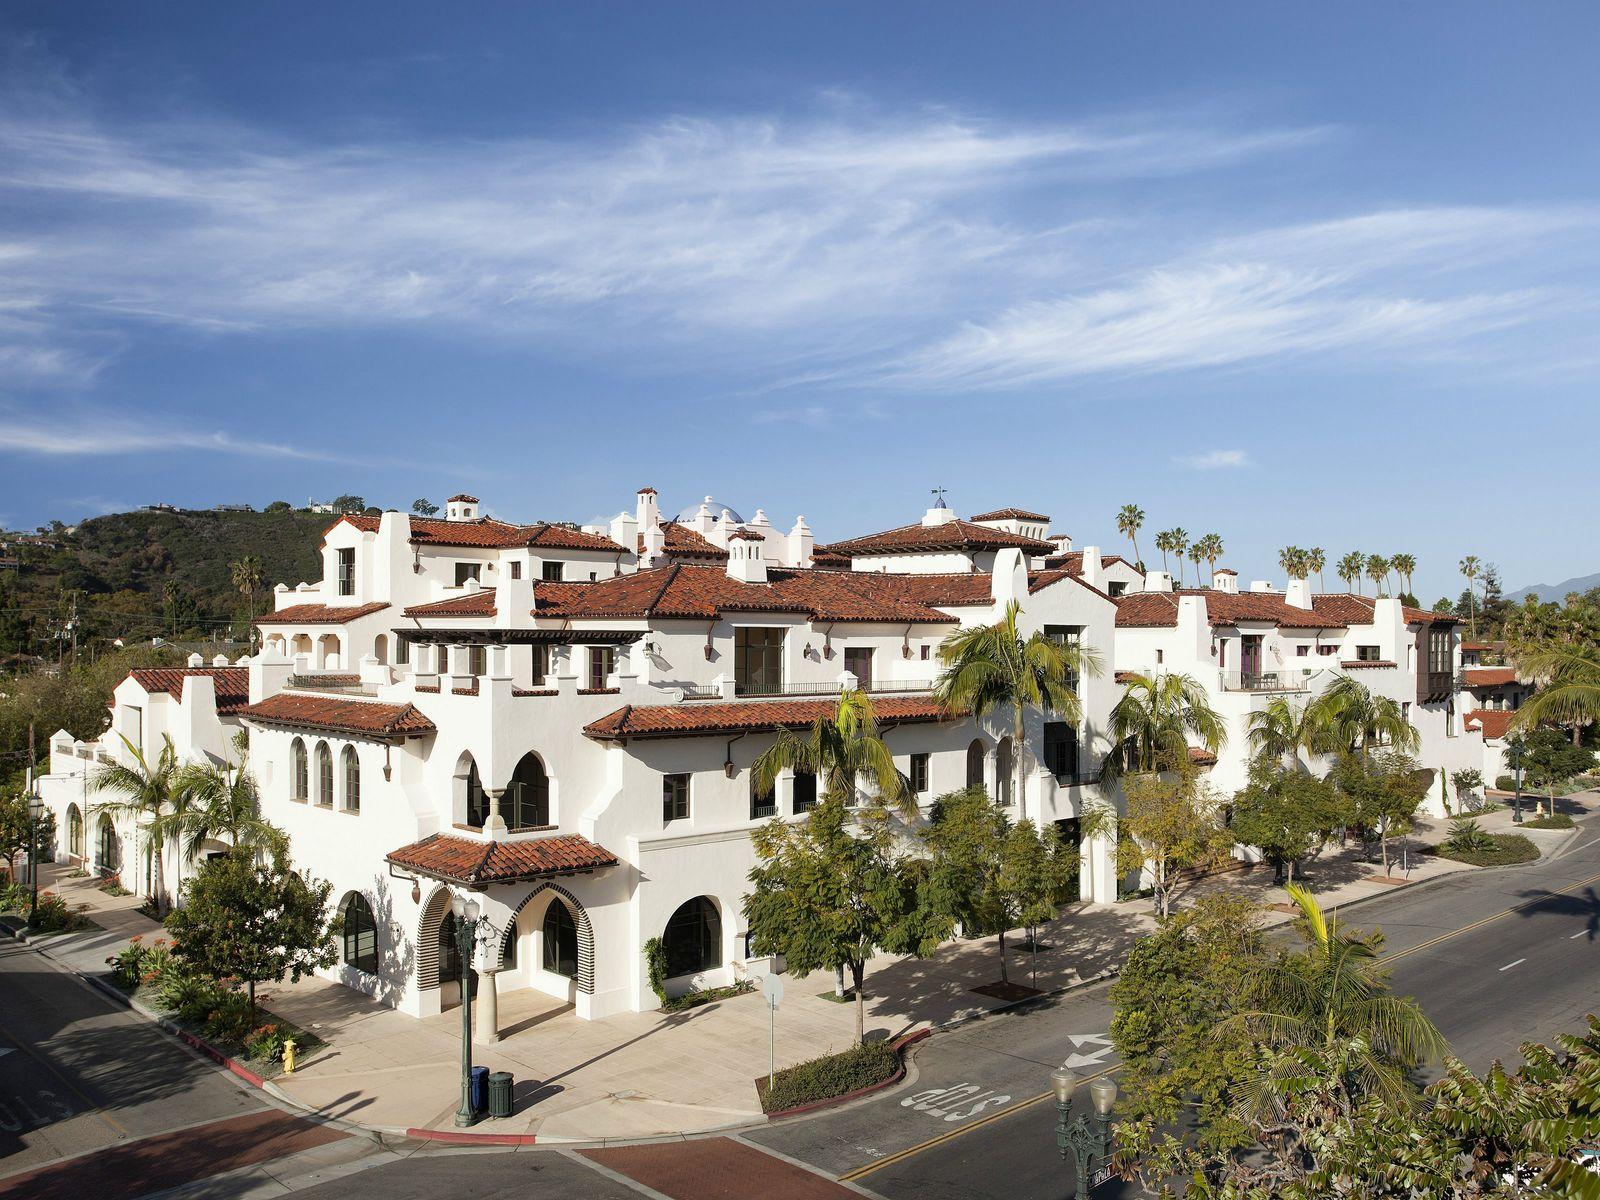 Luxury Downtown Condos